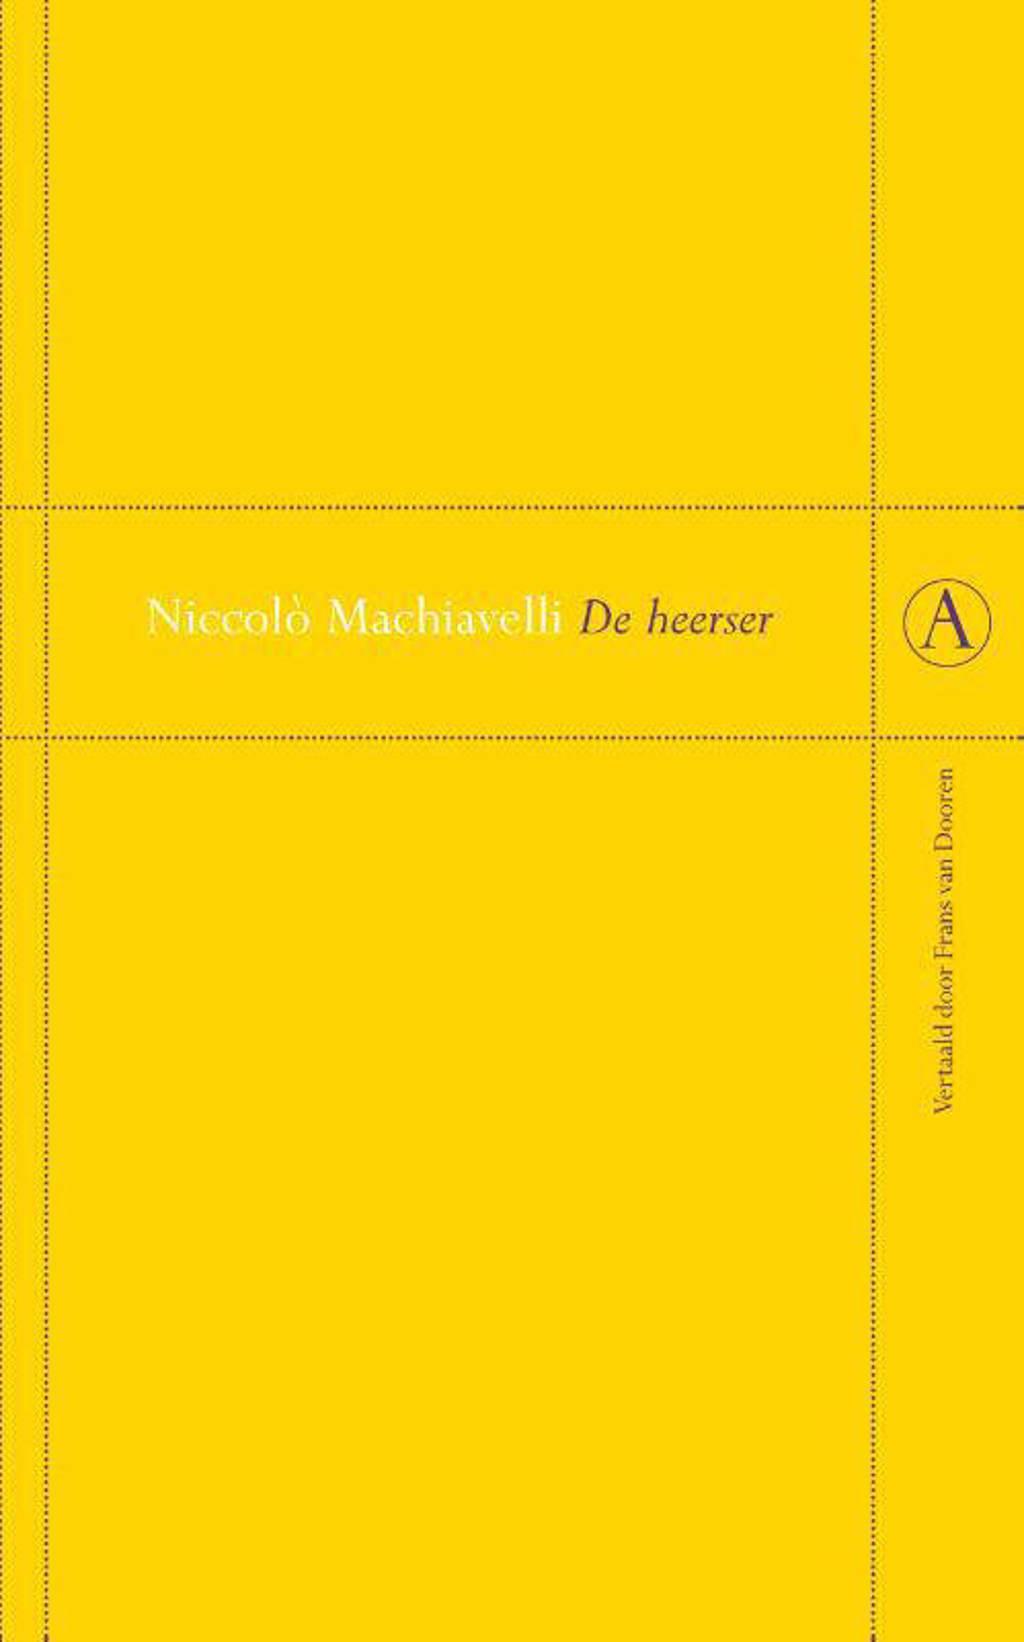 Perpetua reeks: De heerser - Niccolò Machiavelli